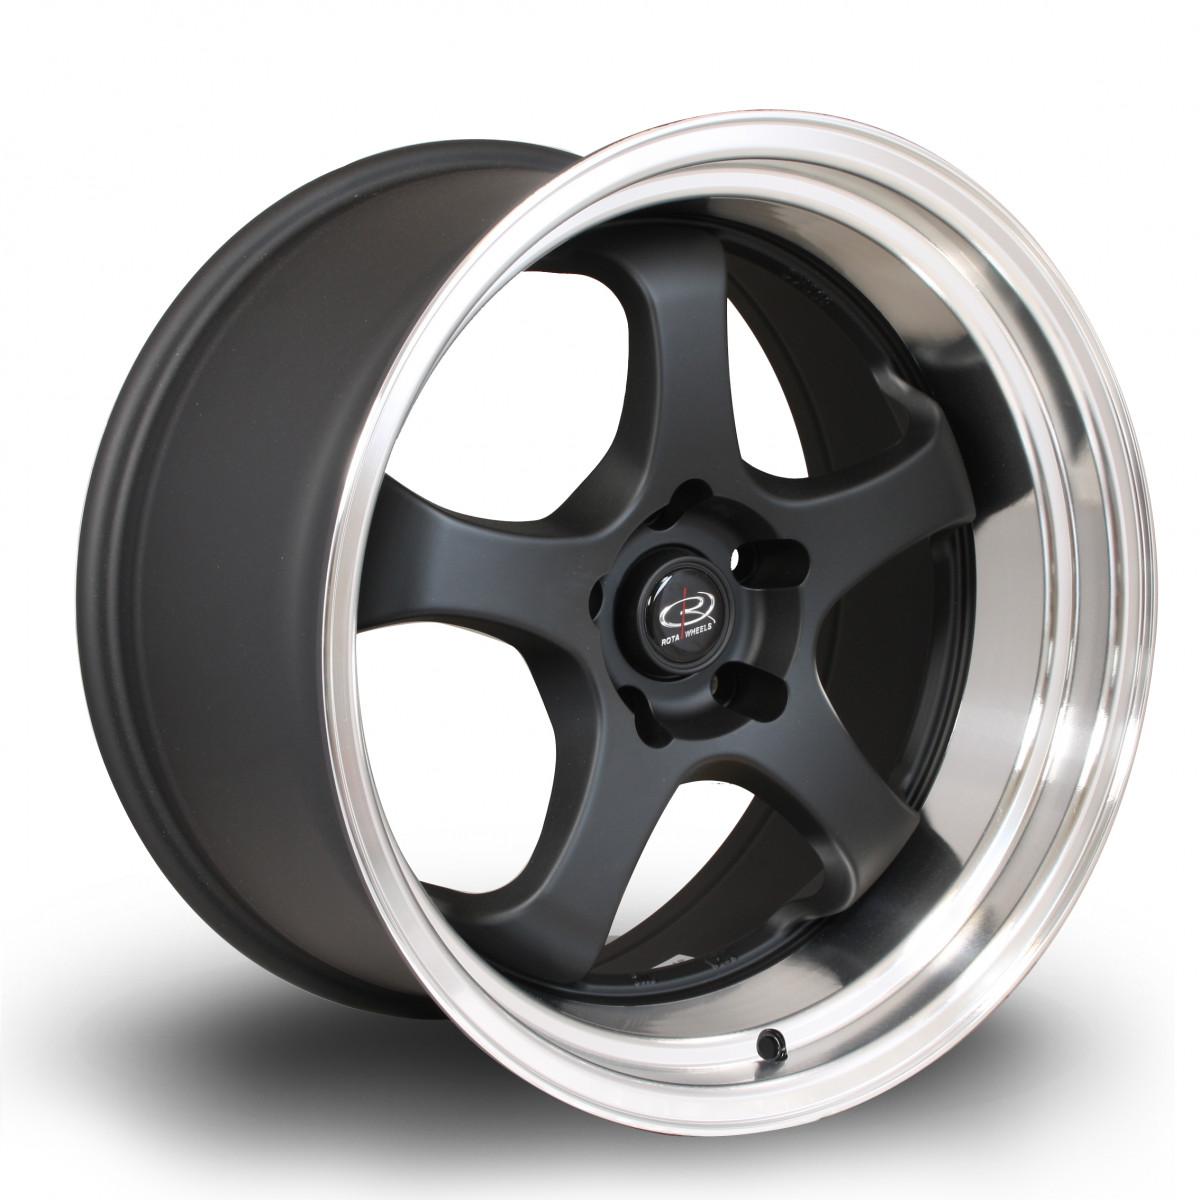 D2EX 18x9.5 5x114 ET12 Flat Black with Polished Lip